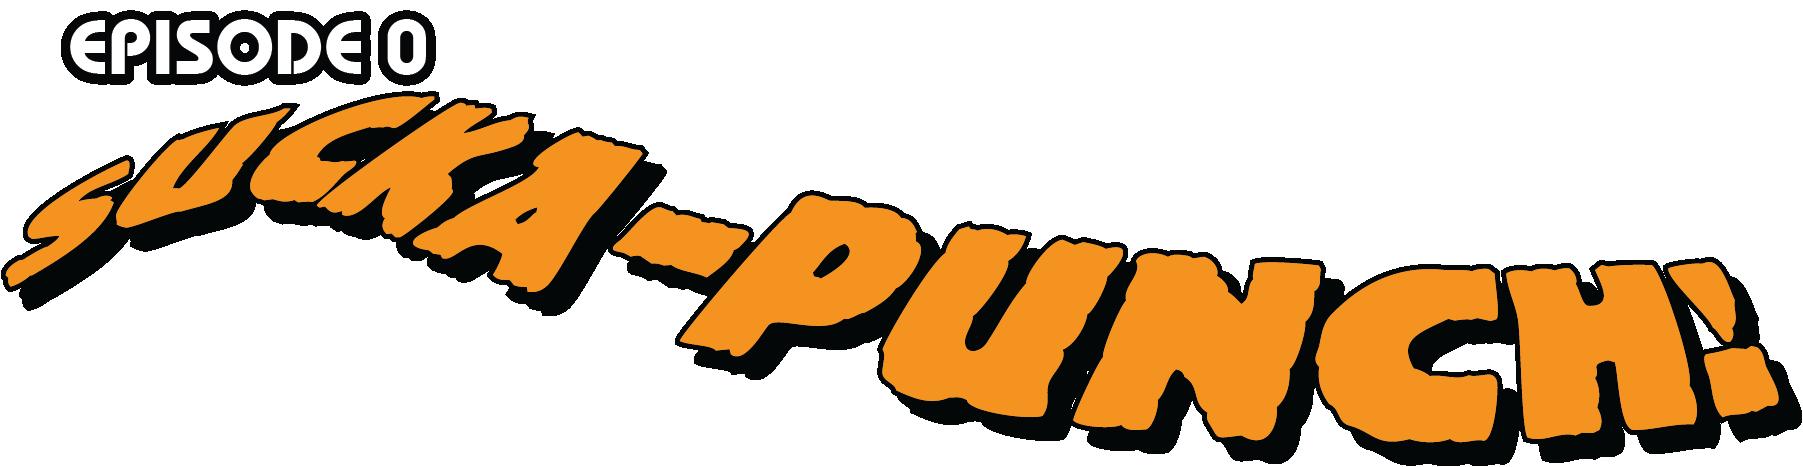 Soul of a Hero - Episode 0 Sucka Punch Logo